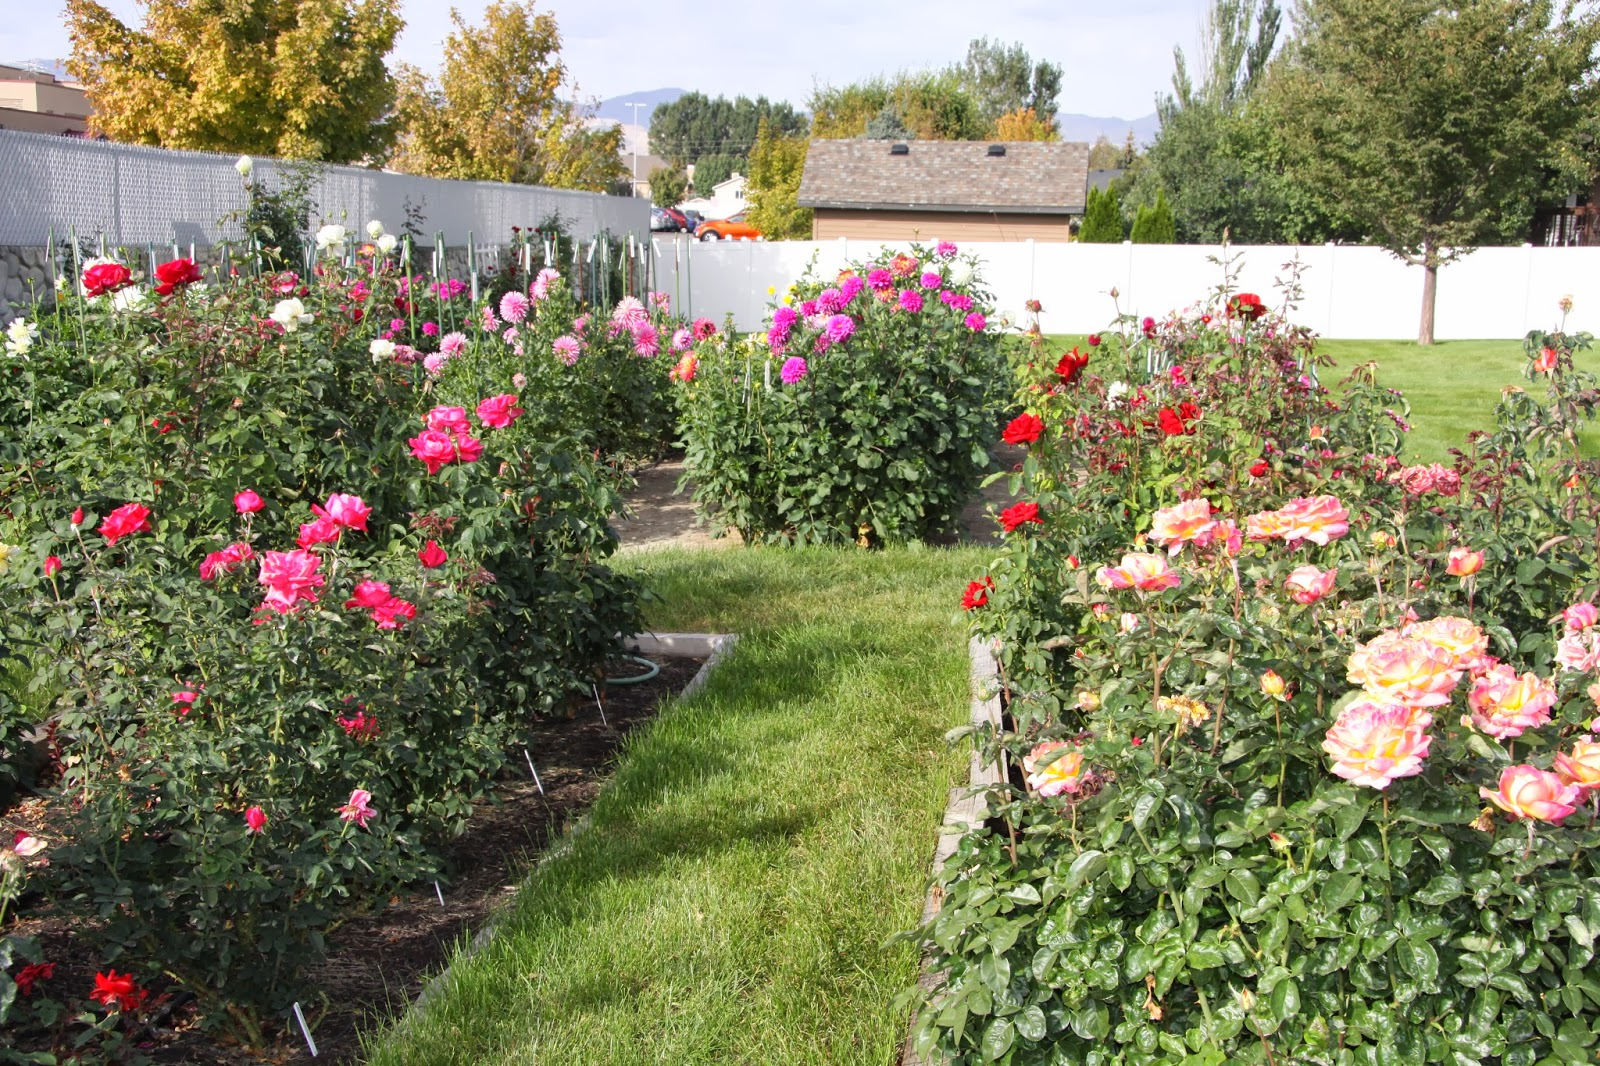 Utah Dahlia Society Dave Ross Garden Tour